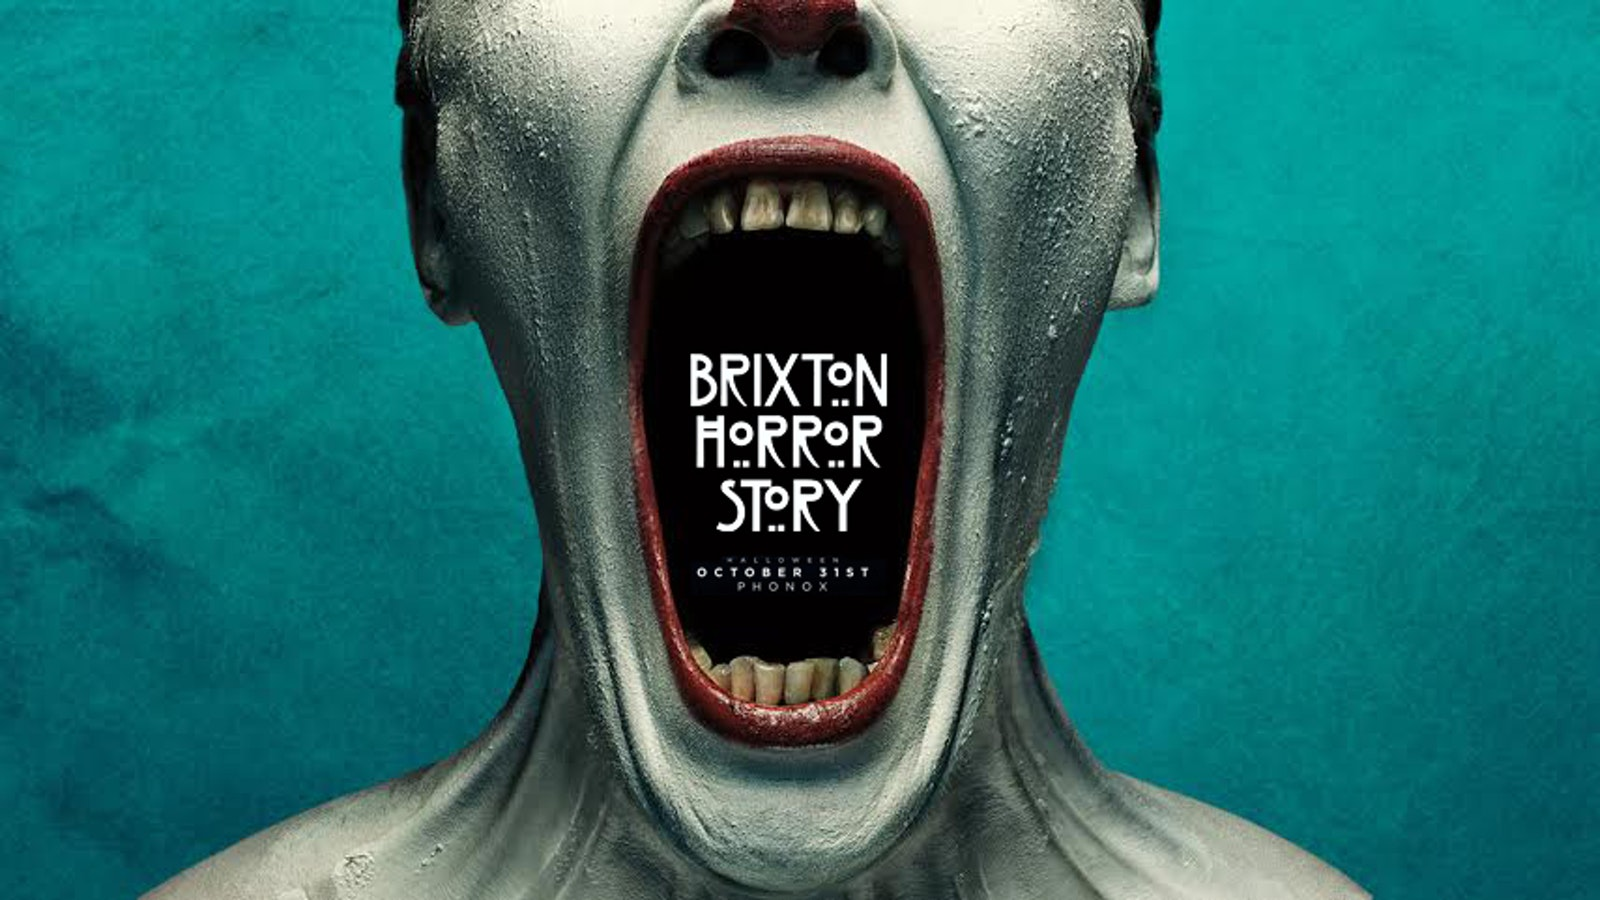 Brixton Horror Story 💀 – The Halloween Party 2021 | Phonox London